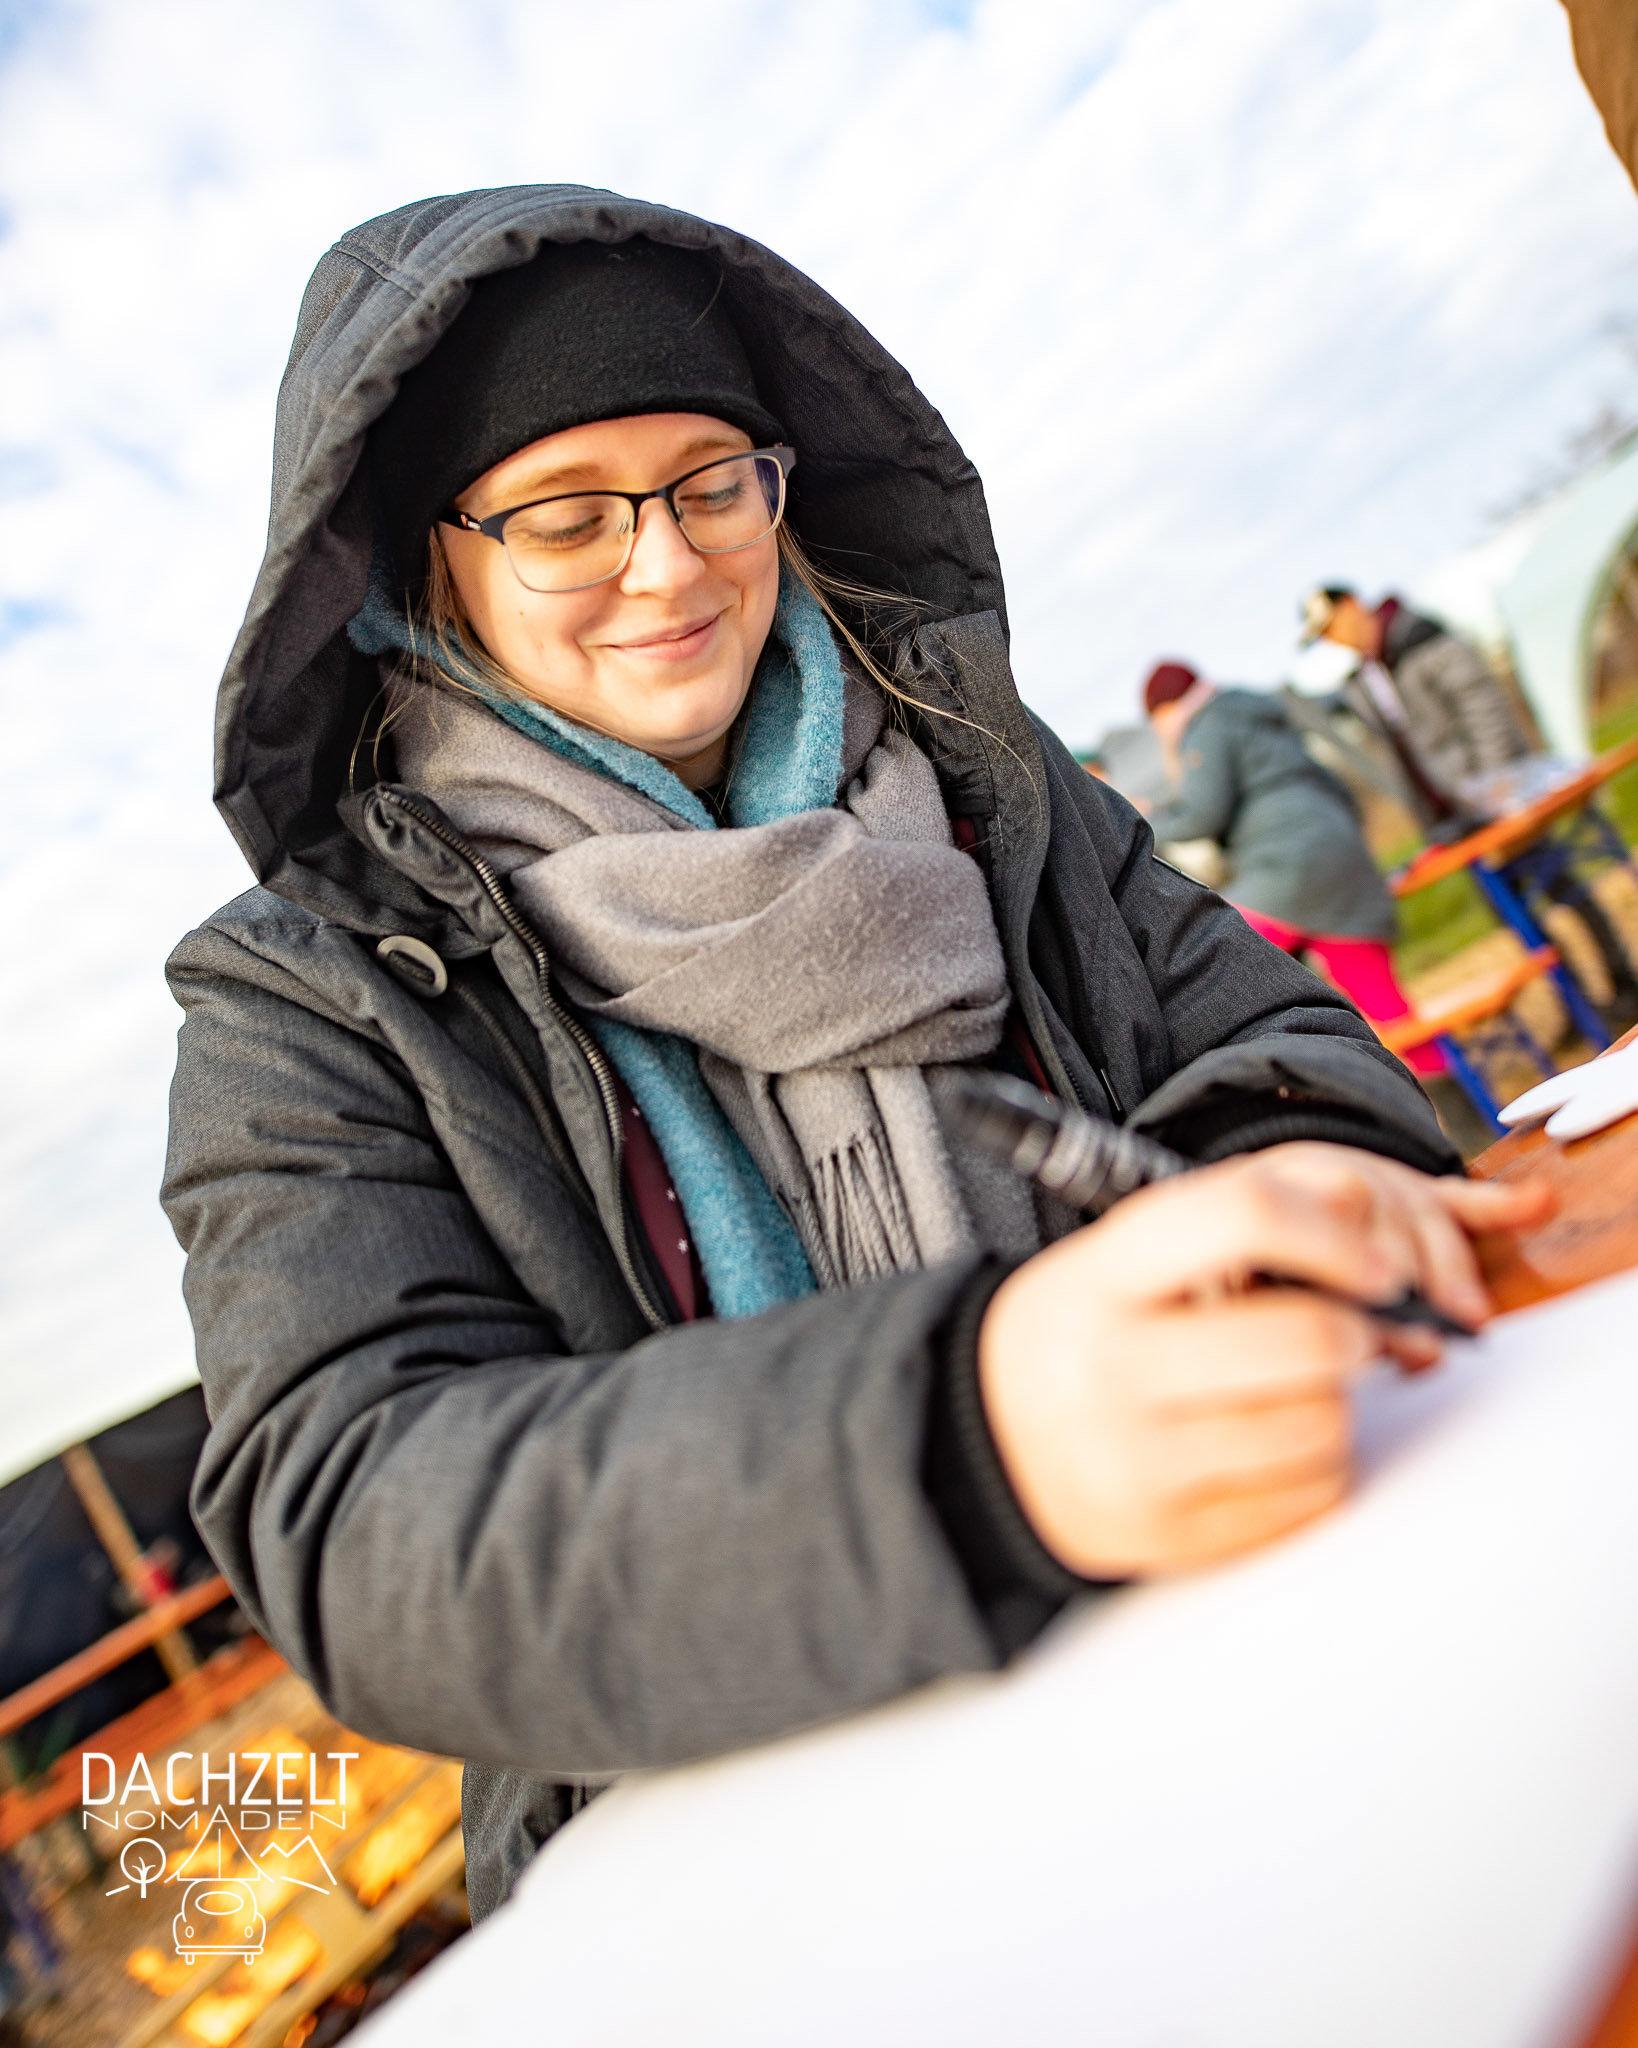 20191230-DACHZELT-SILVESTER-CAMP-Dennis-Brandt- DB 0133-Aufbau